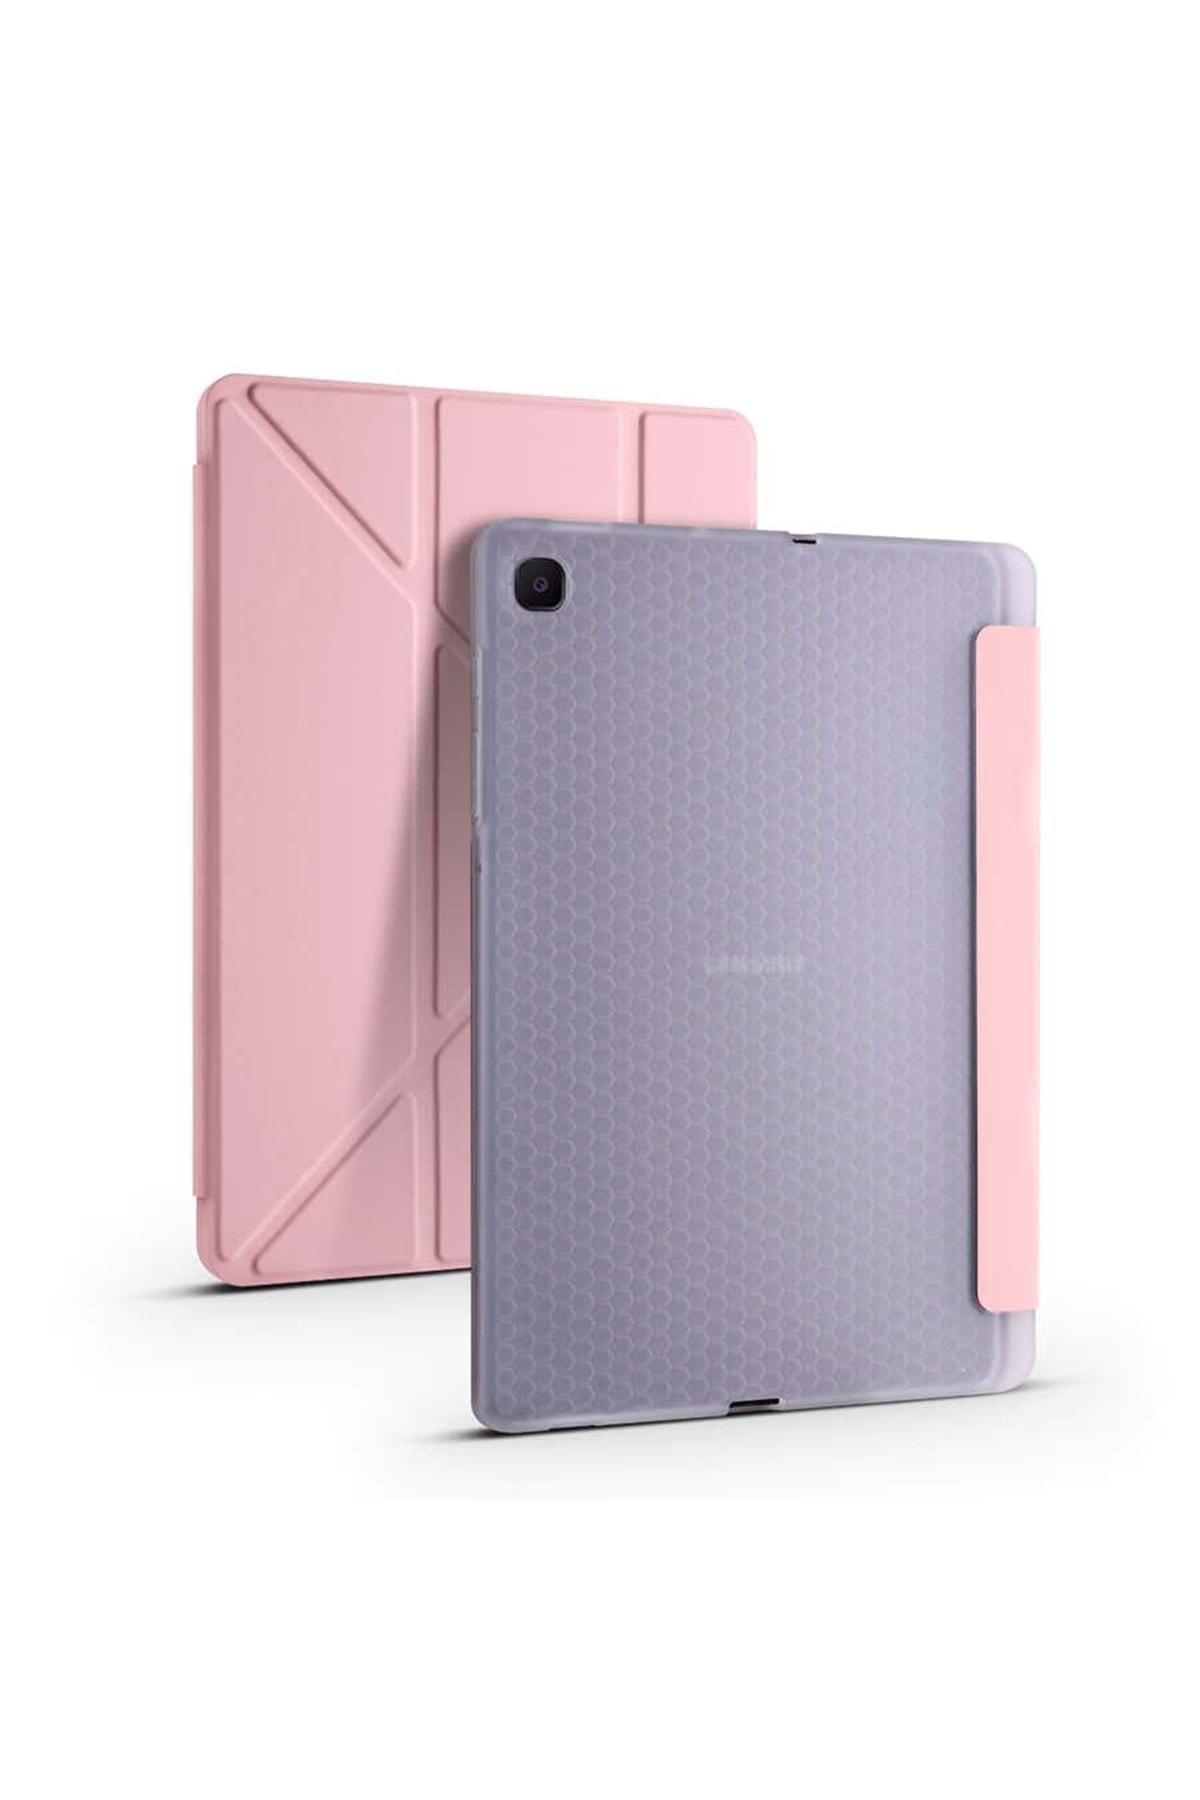 Galaxy Tab S6 Lite P610 Kılıf Kalemlikli Standlı Katlanabilen Maximum Koruma